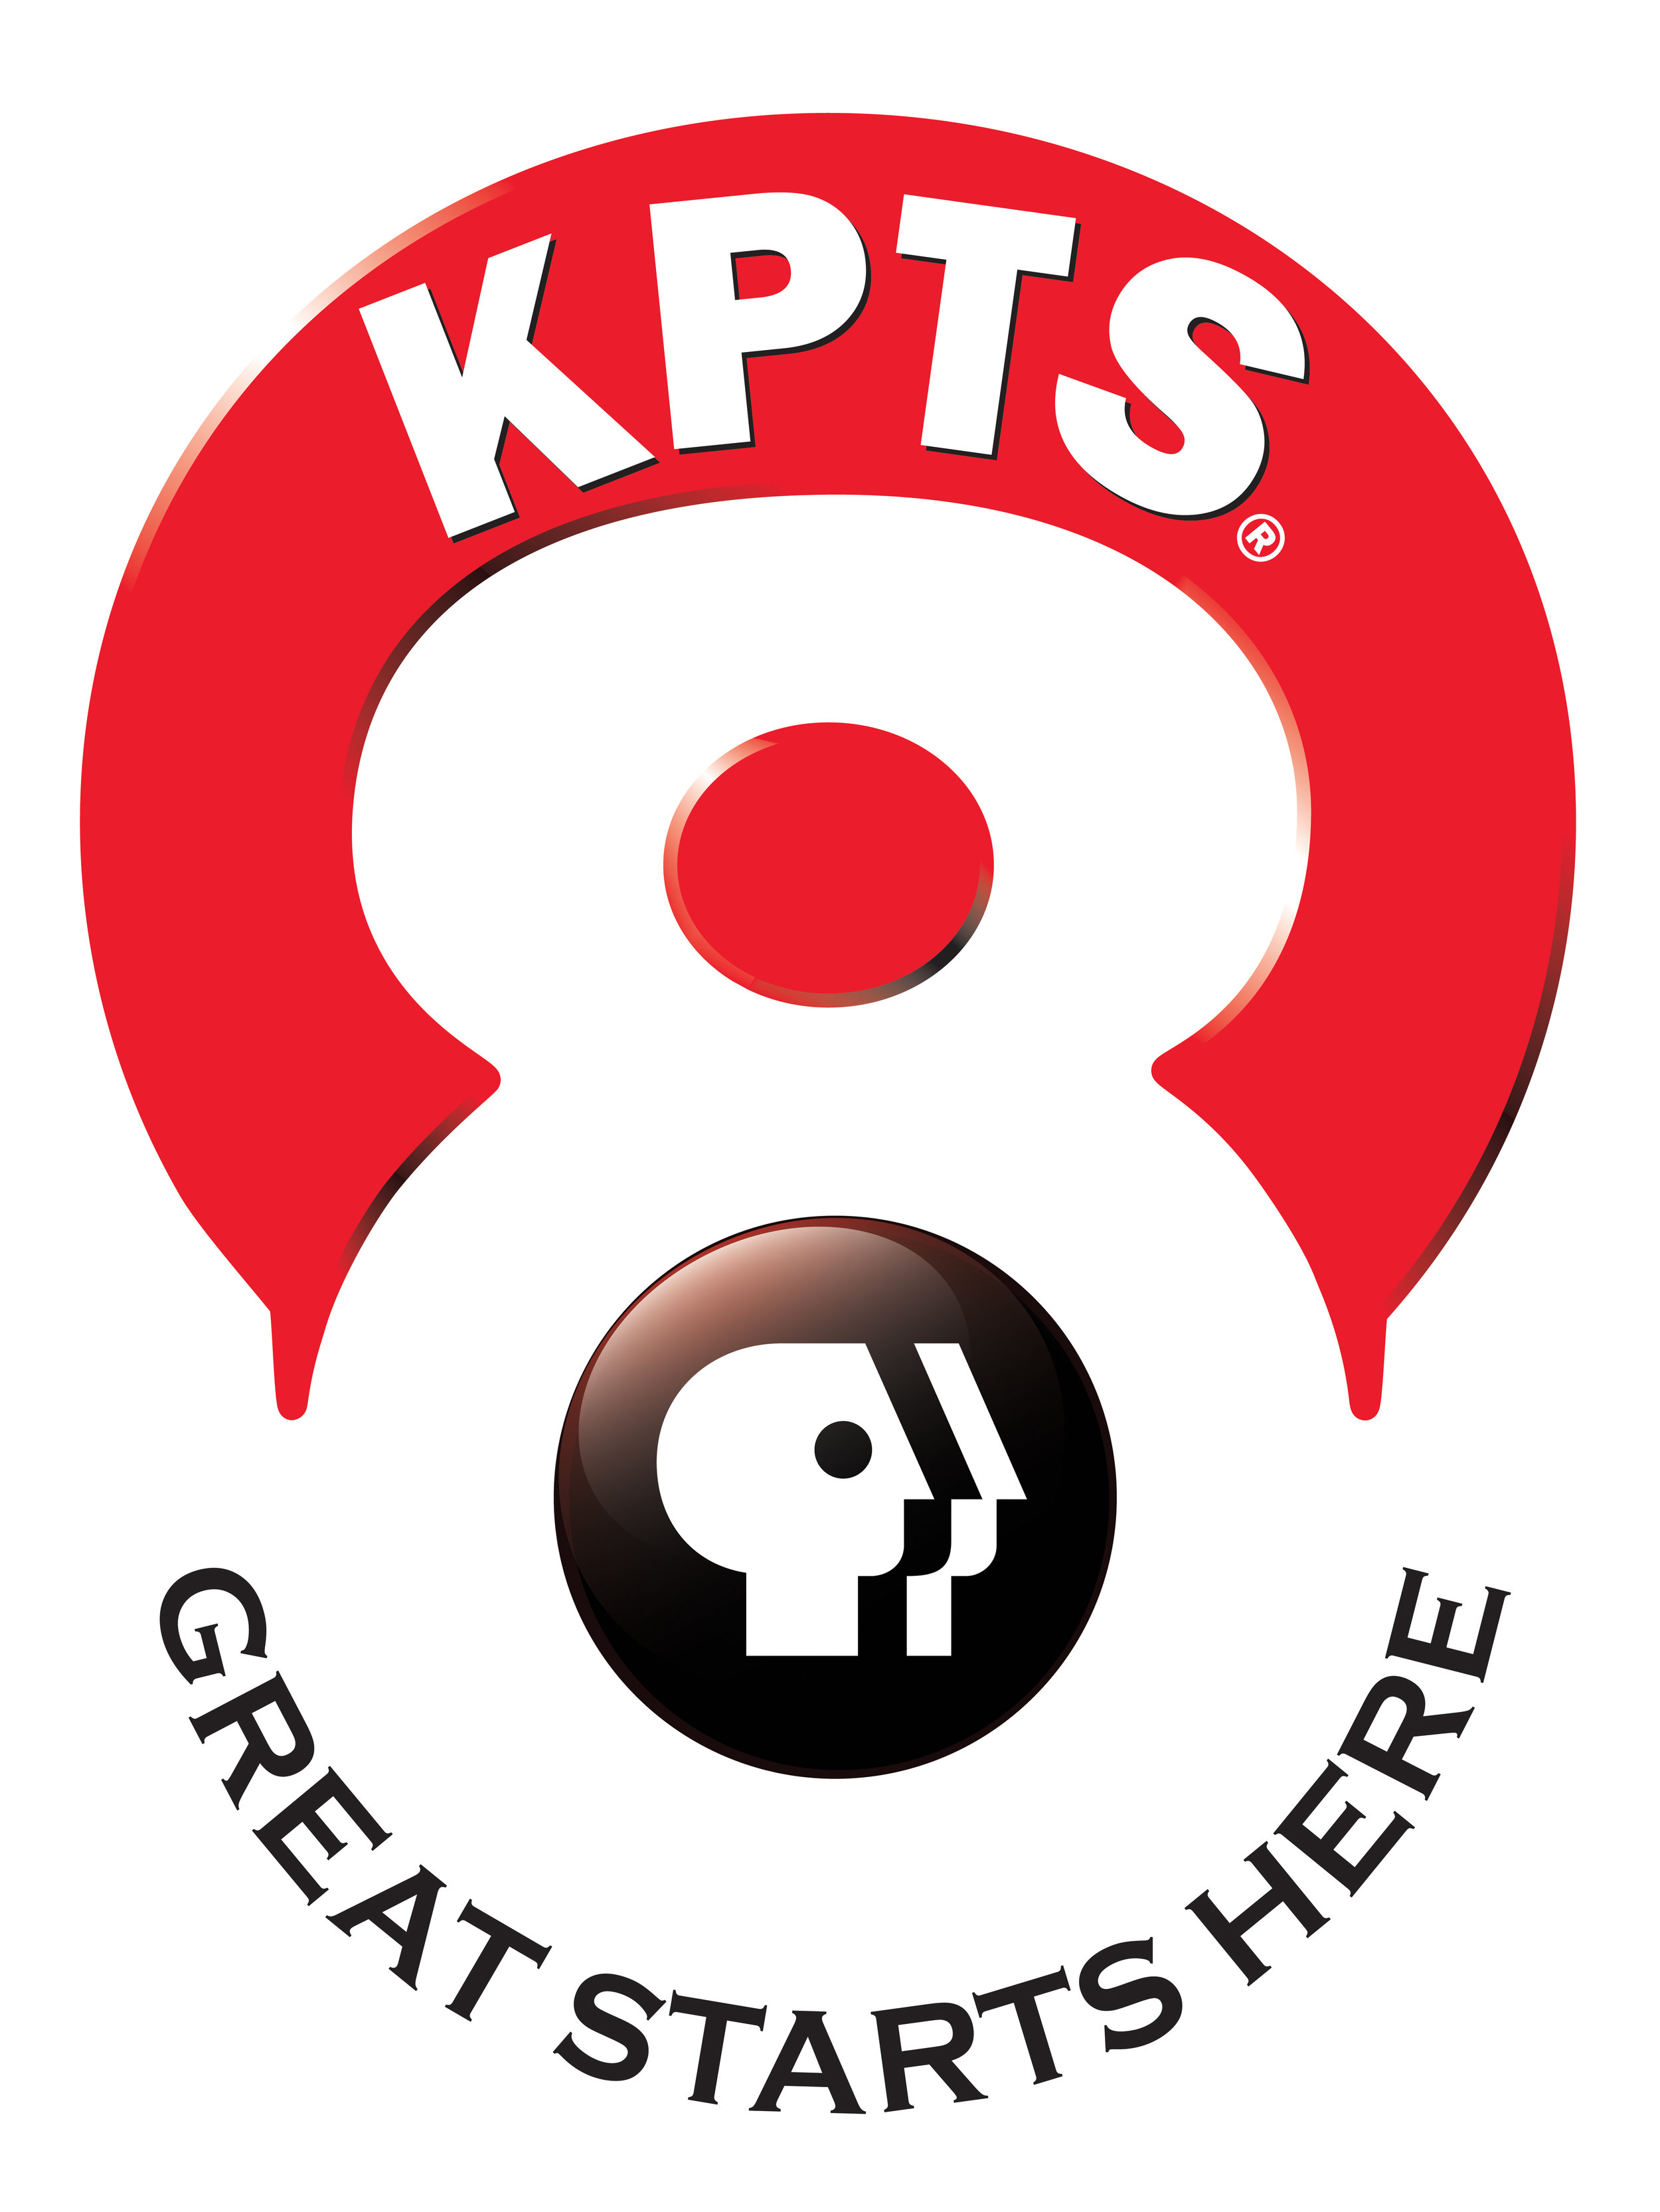 KPTSPBS2019SlideGraphic_vch.jpg